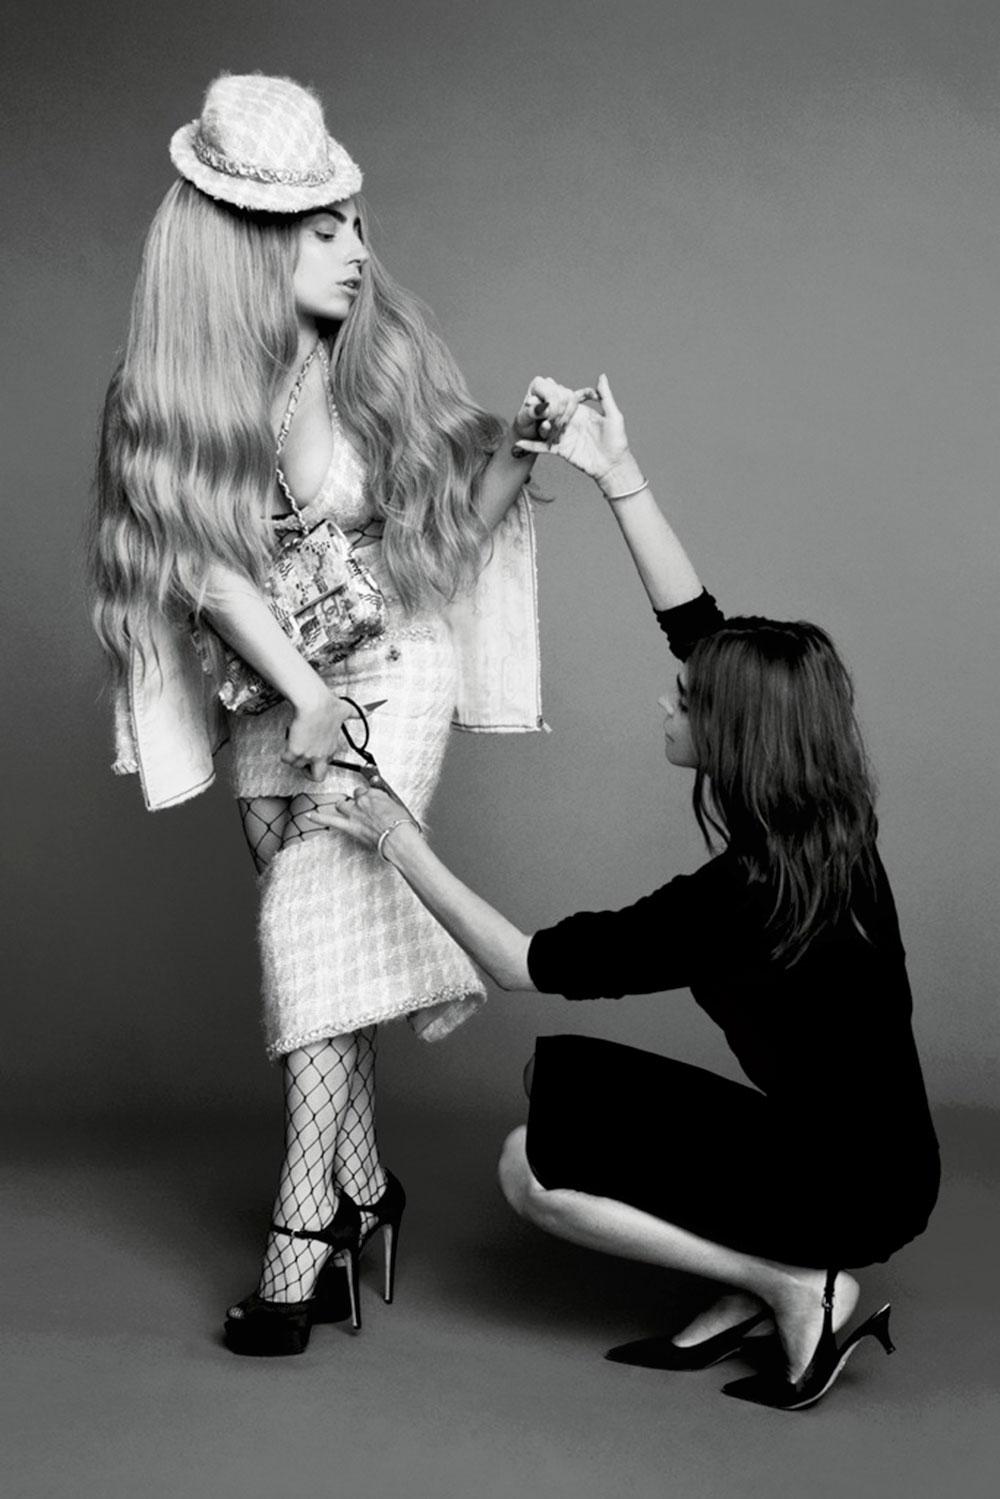 LADY GAGA - Harpers Bazaar Magazine Photoshoot by